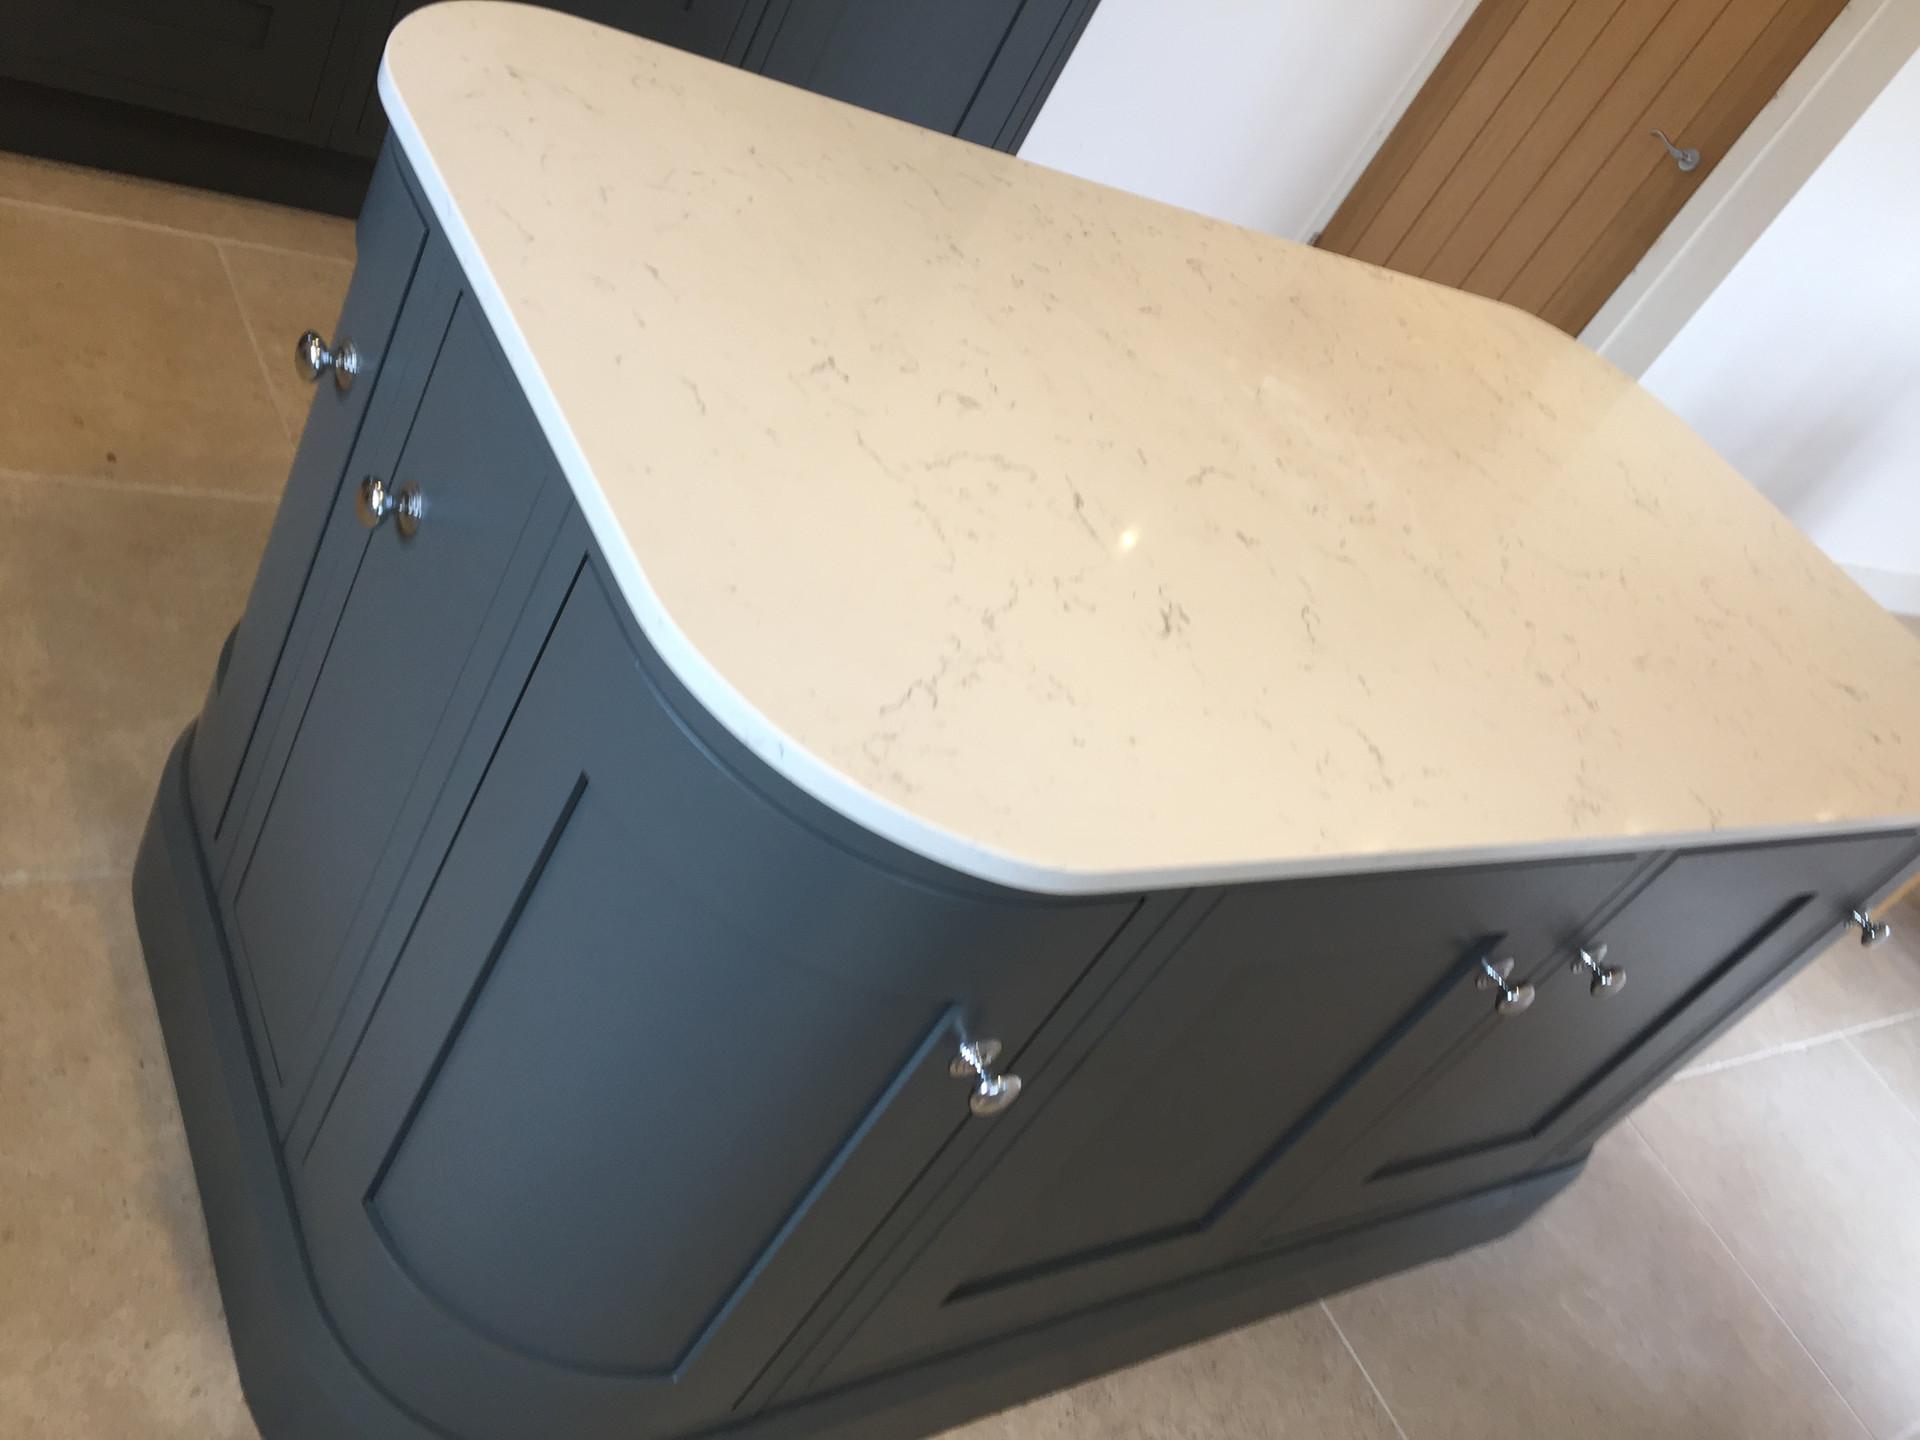 Bespoke inframe painted Oak fitted kitchen in Light Grey & Slate Grey. Quartz worktops and Neff applainces